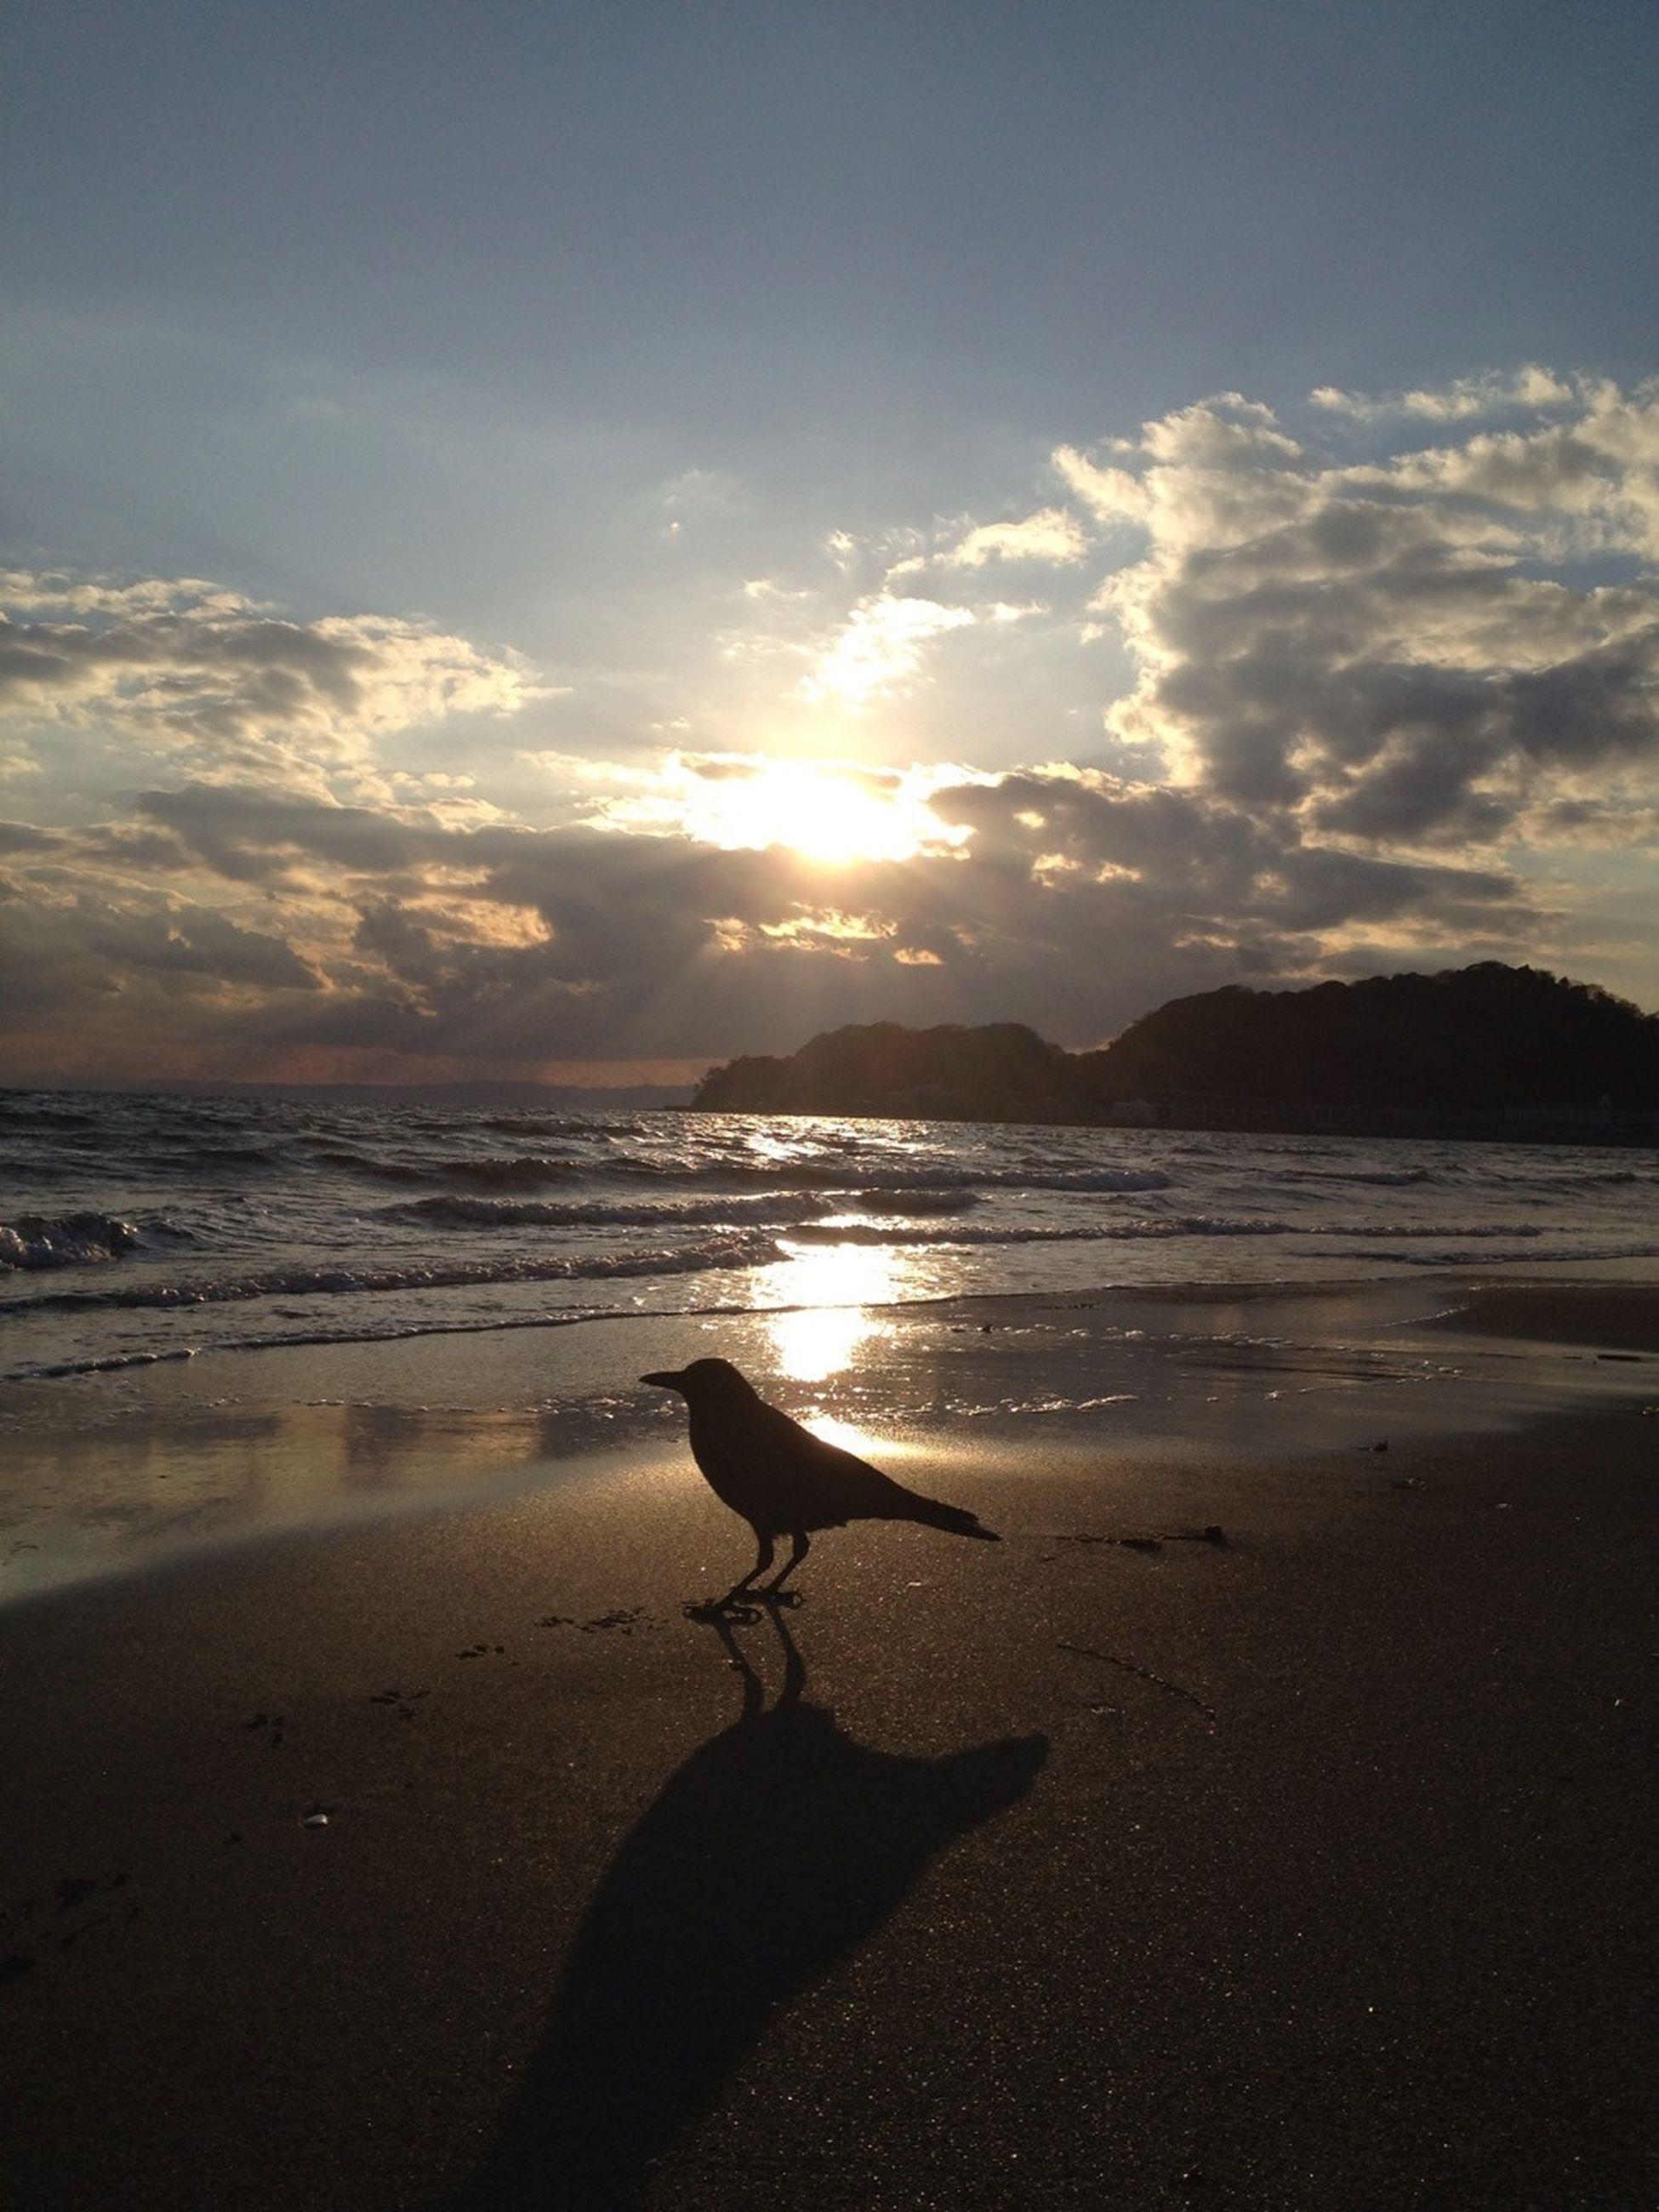 beach, sea, animal themes, shore, water, sunset, one animal, sky, horizon over water, sand, bird, silhouette, beauty in nature, animals in the wild, scenics, tranquil scene, cloud - sky, sunlight, sun, nature